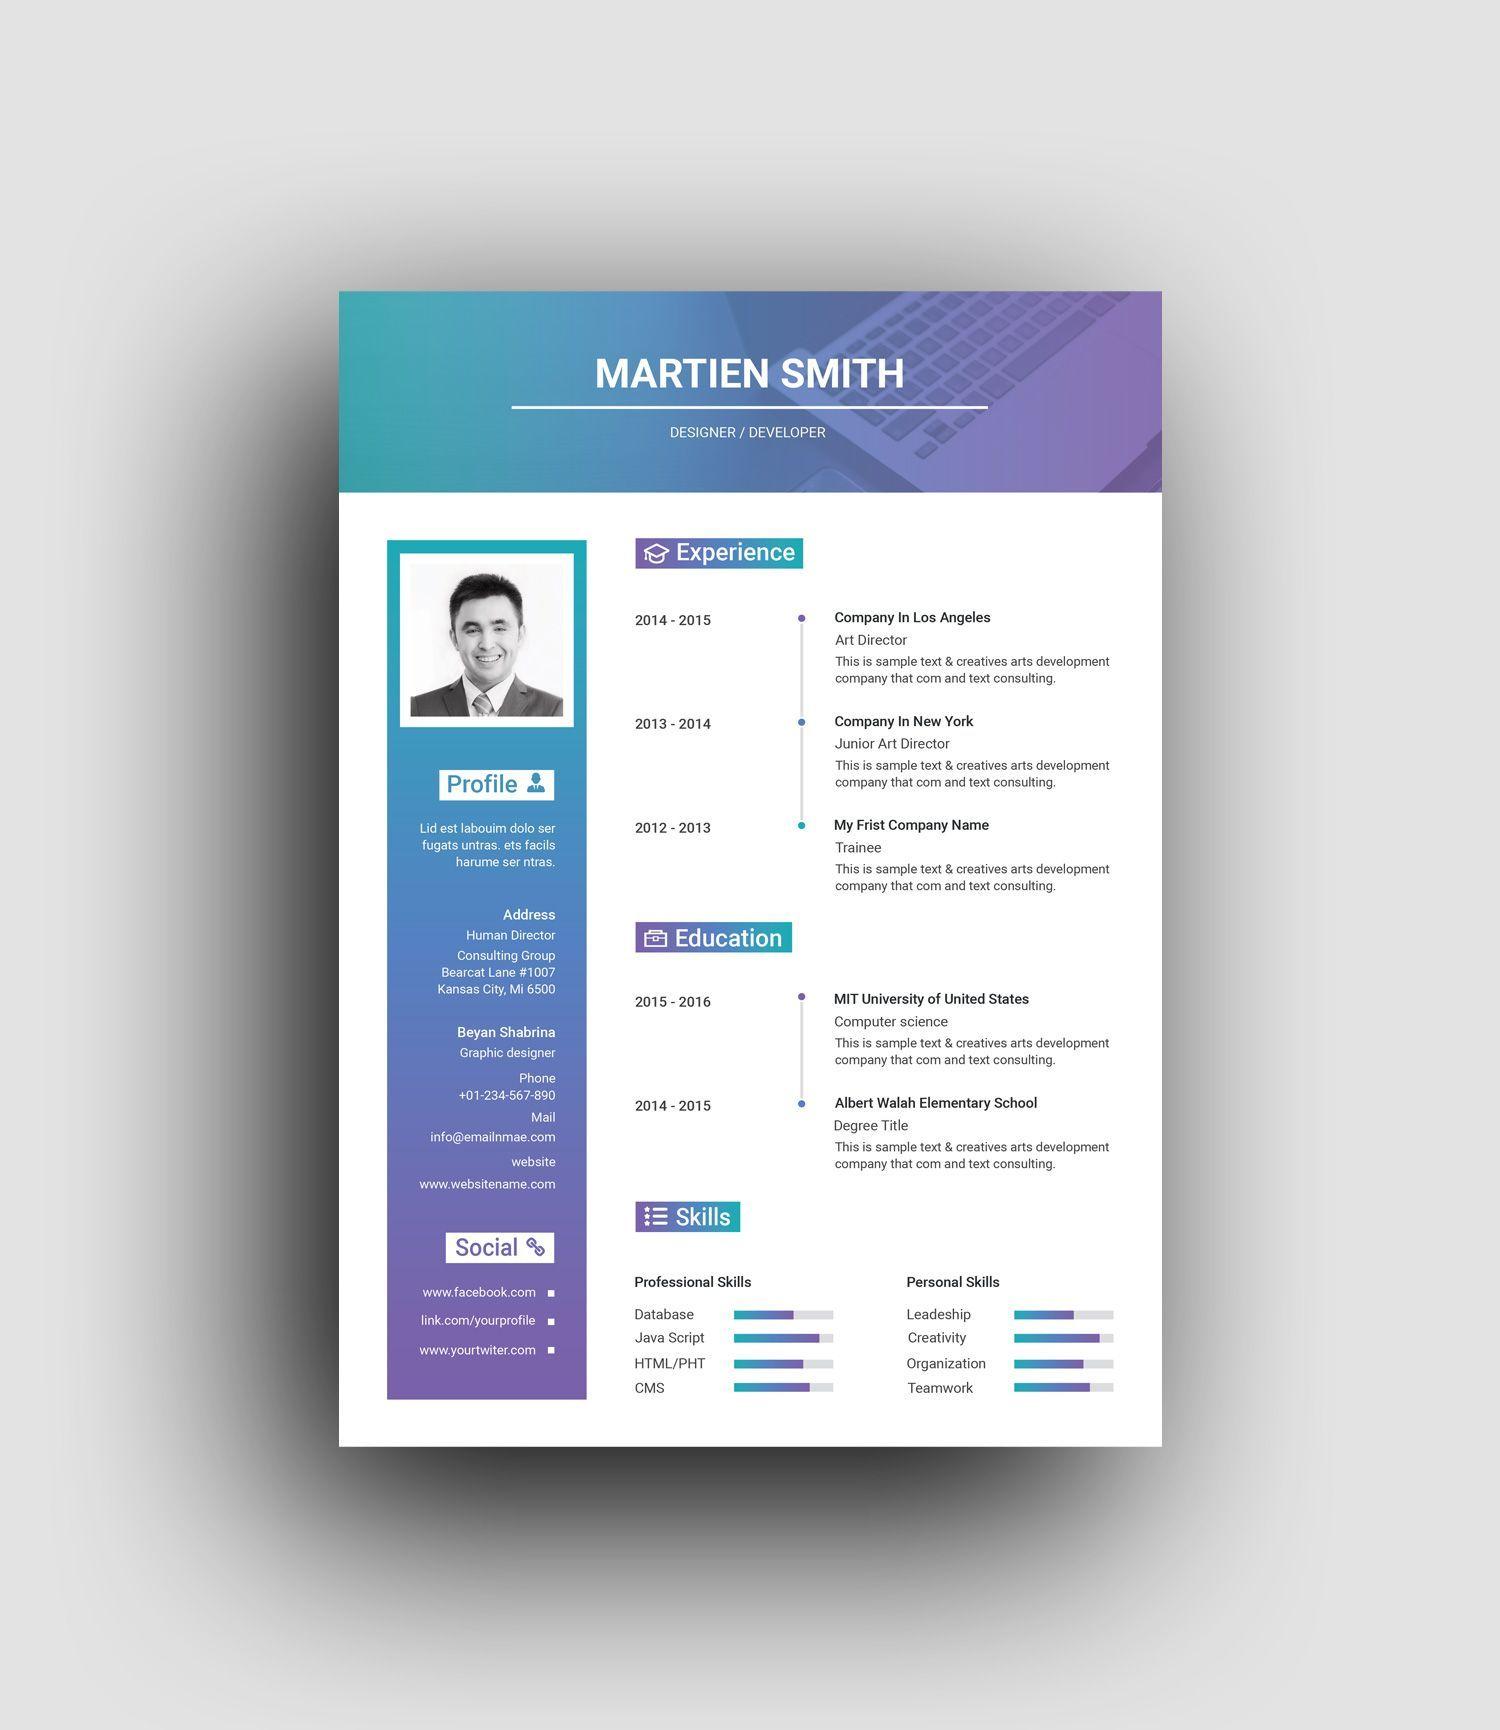 Hades elegant professional resume template 5 resume